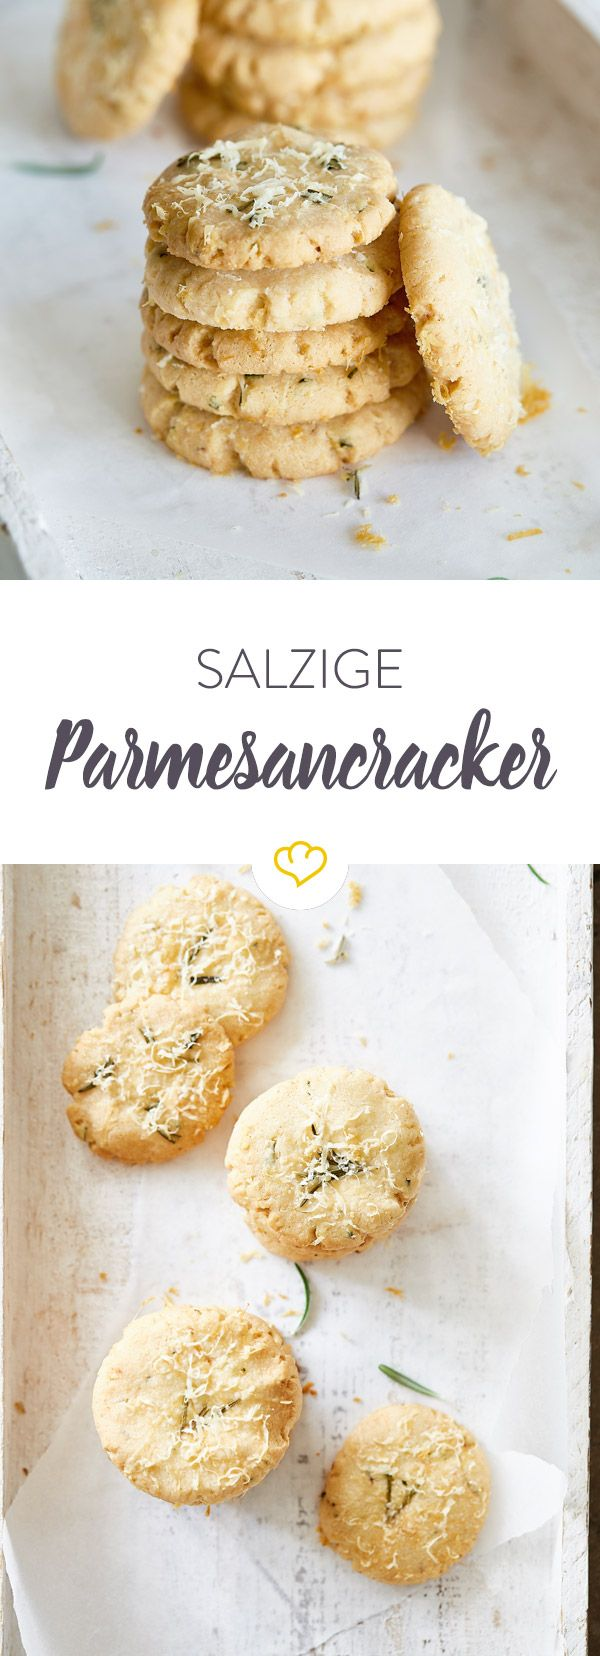 Salzige Parmesankekse mit Rosmarin